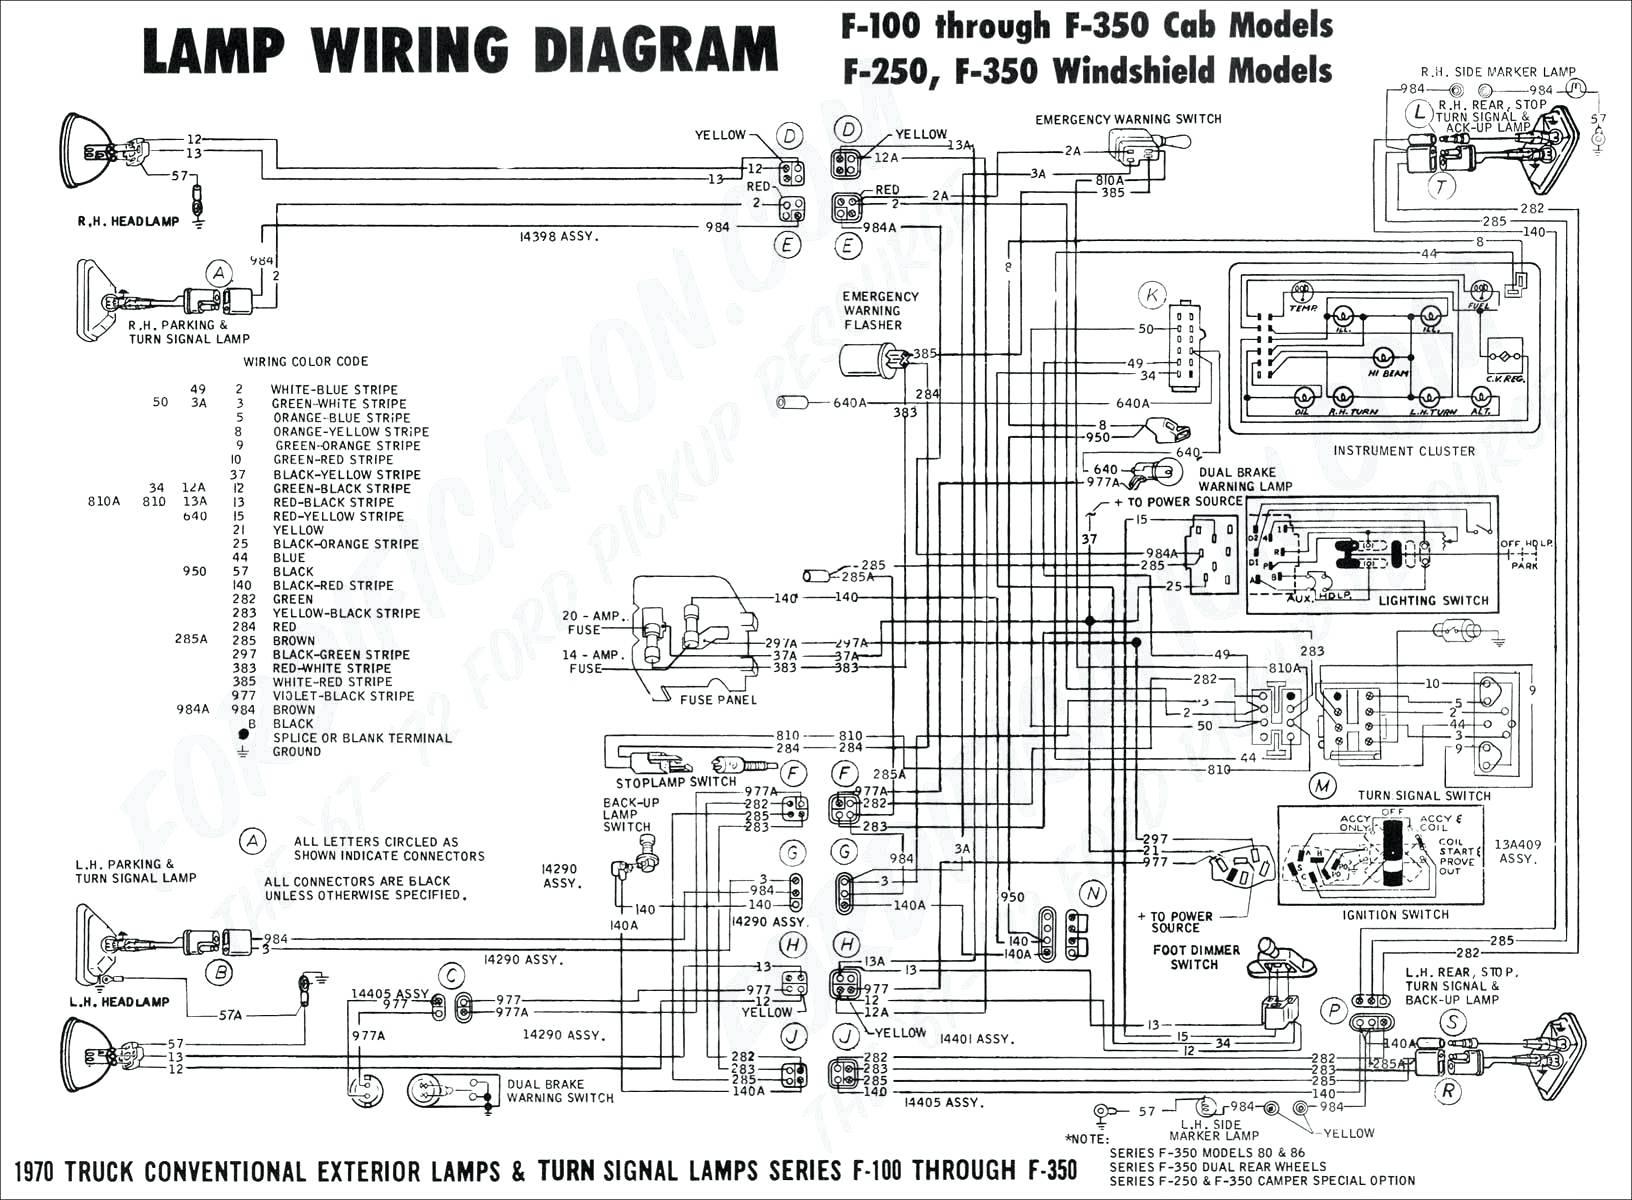 hight resolution of 97 f150 trailer wiring diagram free wiring diagram rh ricardolevinsmorales com 1994 f150 wiring diagram 96 f150 wiring diagram